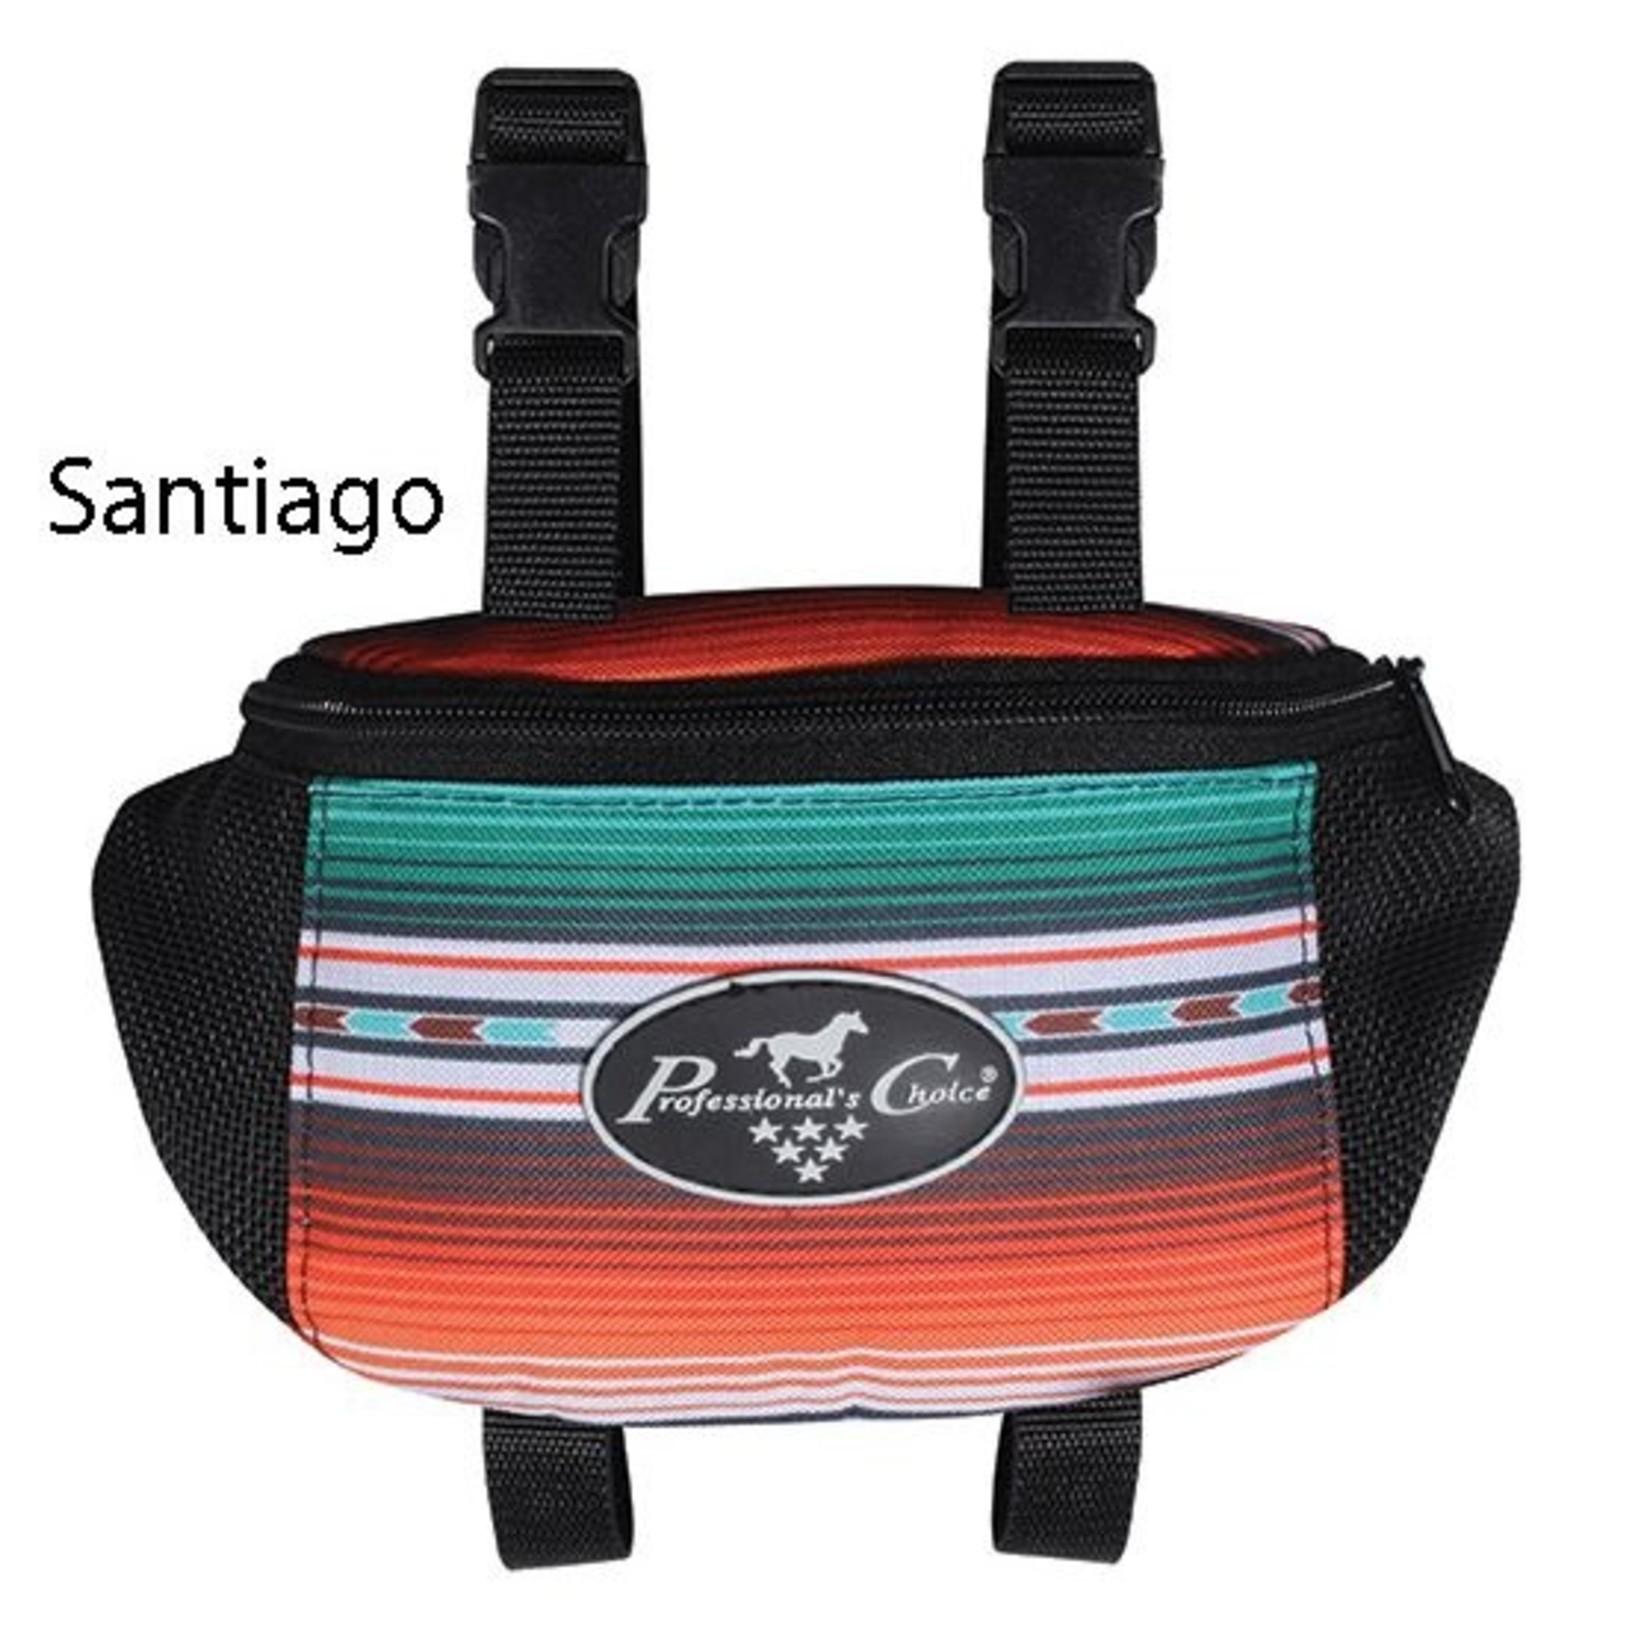 PC Pommel Bag Santiago